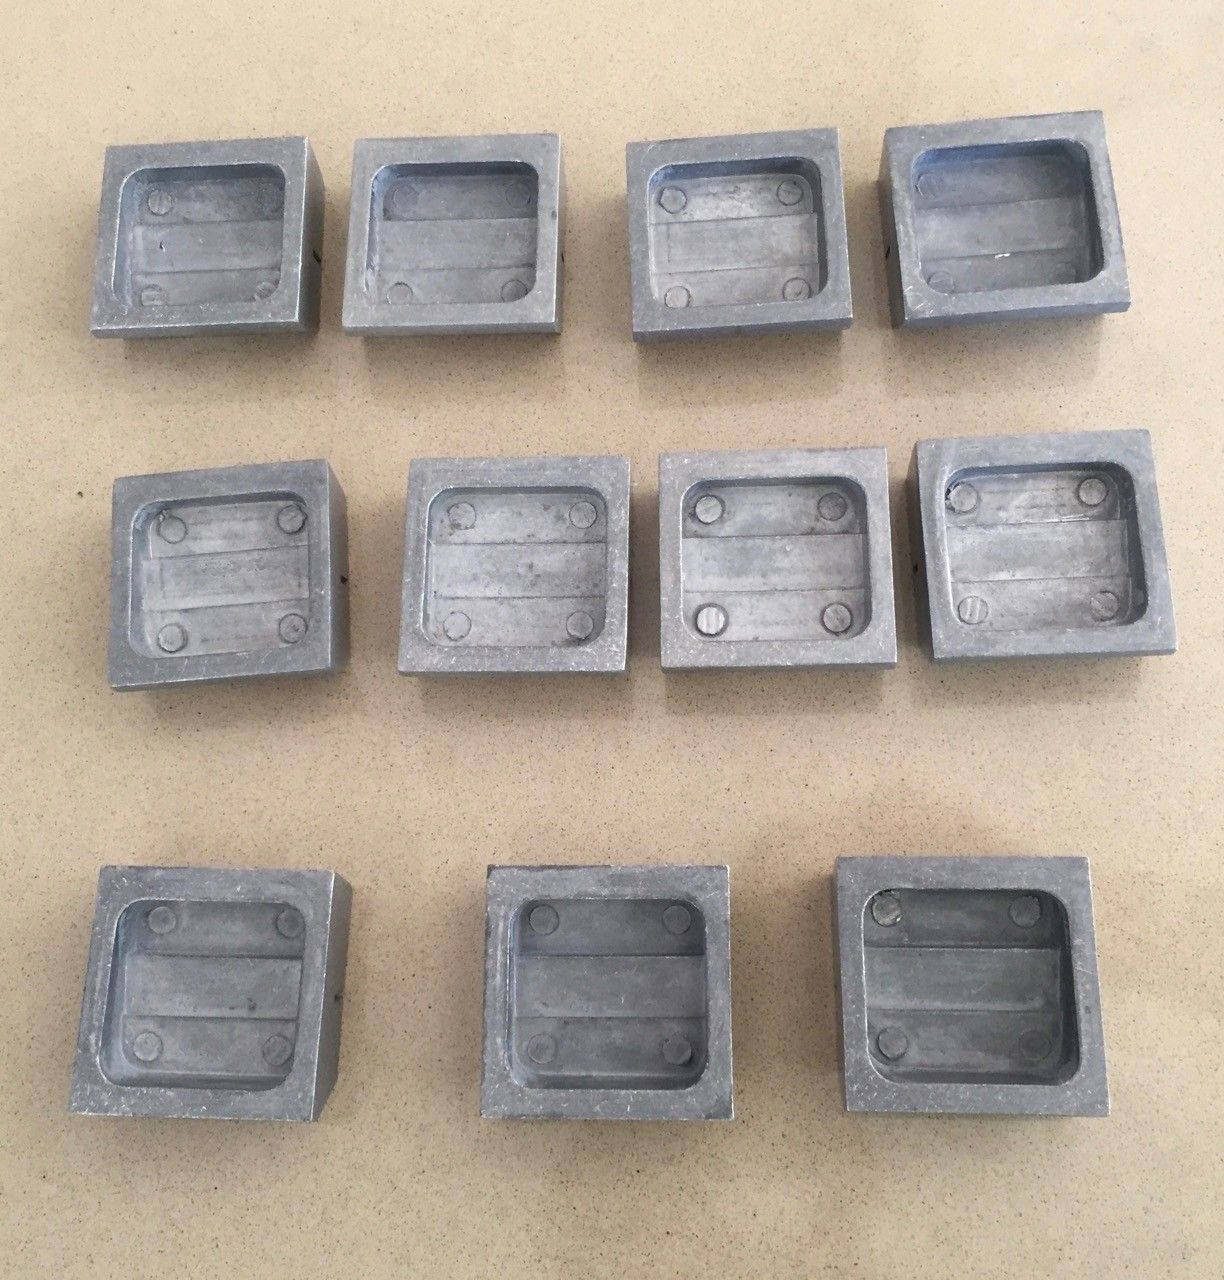 Aluminium Card Blocks (will separate) - Oakley Card Stand - 1 (1).jpg